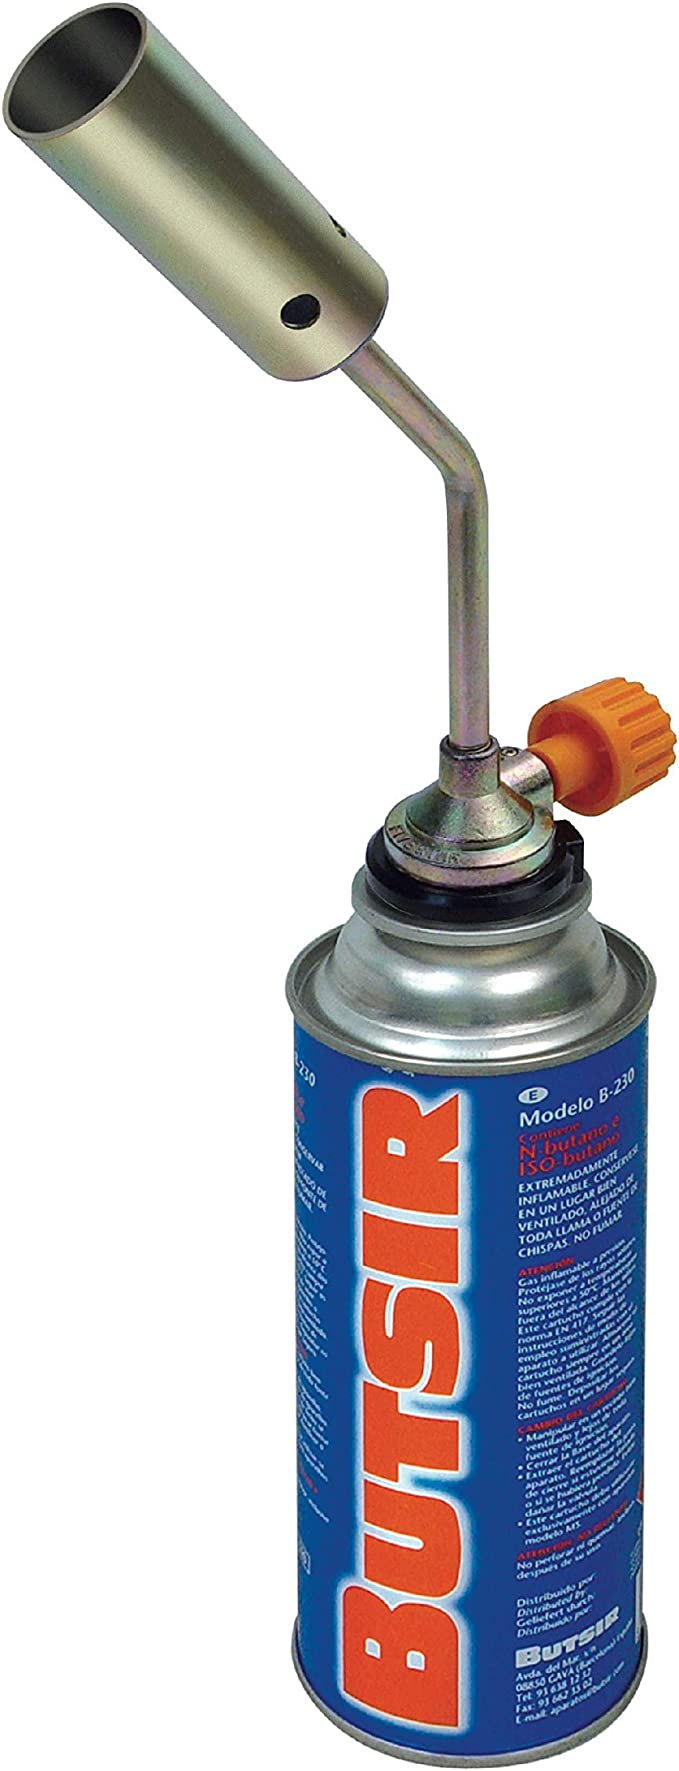 Butsir Soplete NS-1000 Incluido Cartucho de Gas B-250 ...